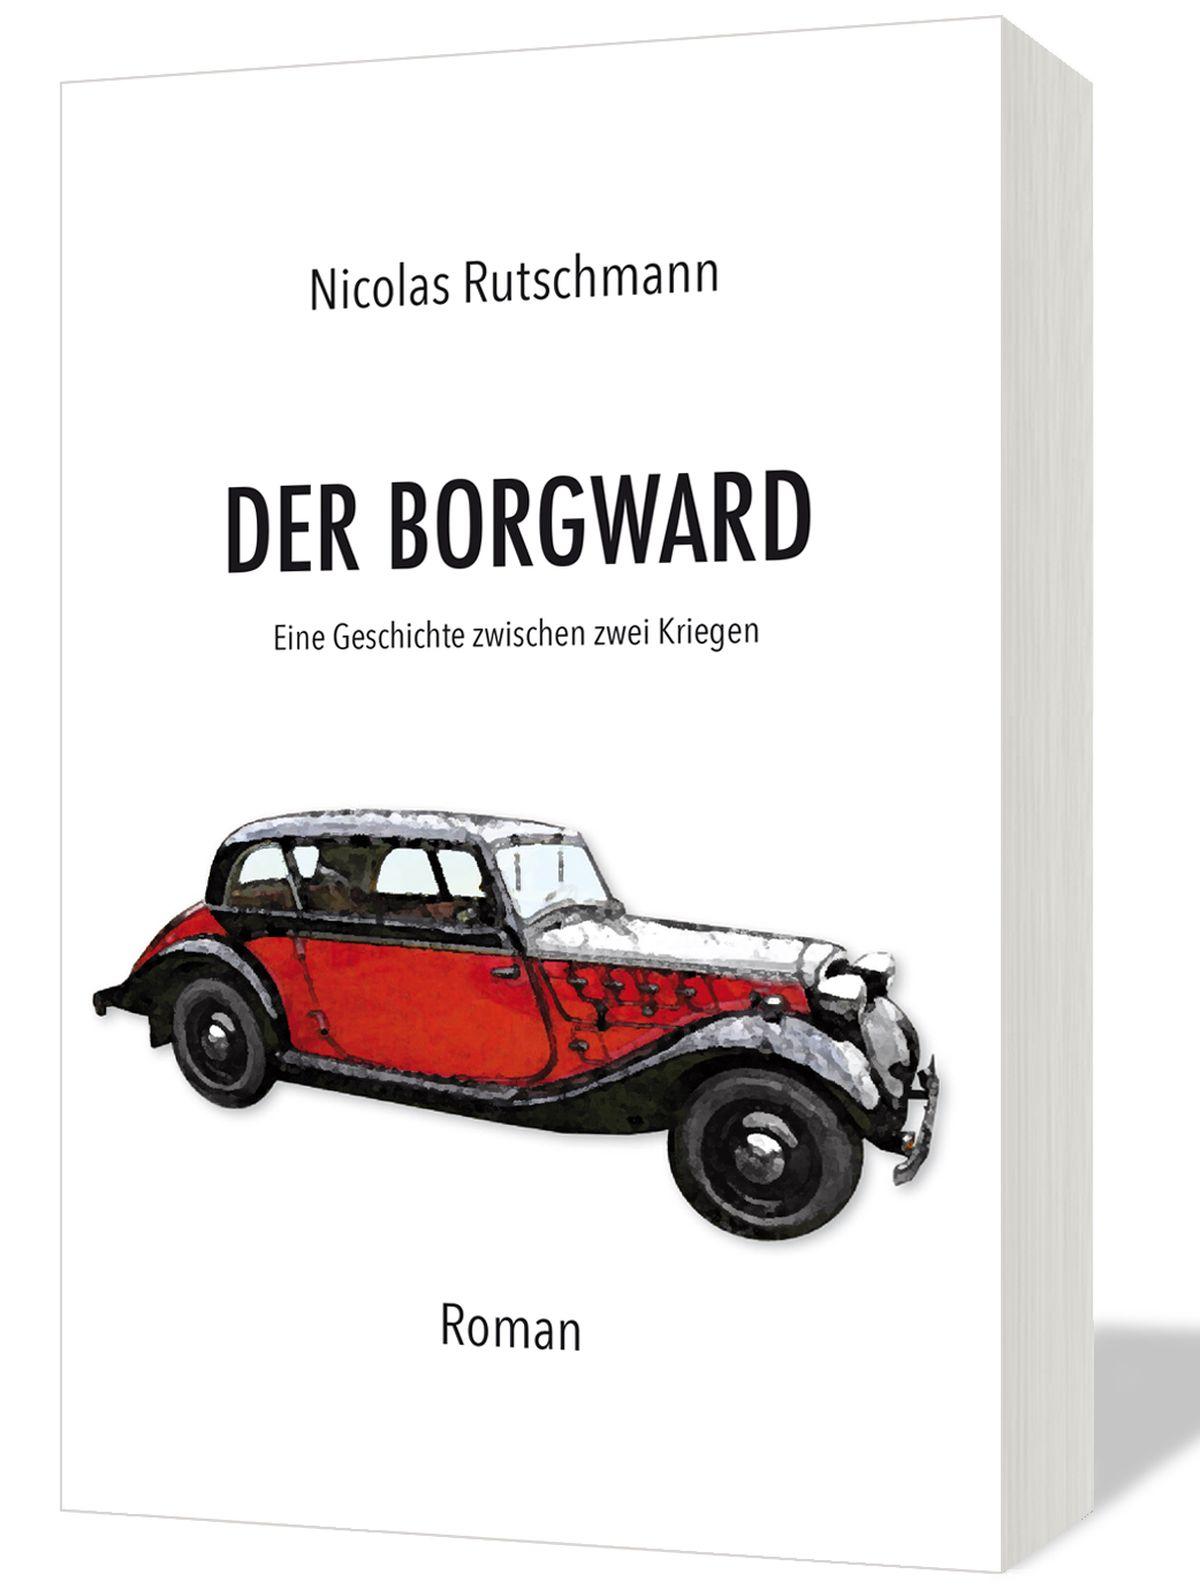 Nicolas Rutschmann: Der Borgward